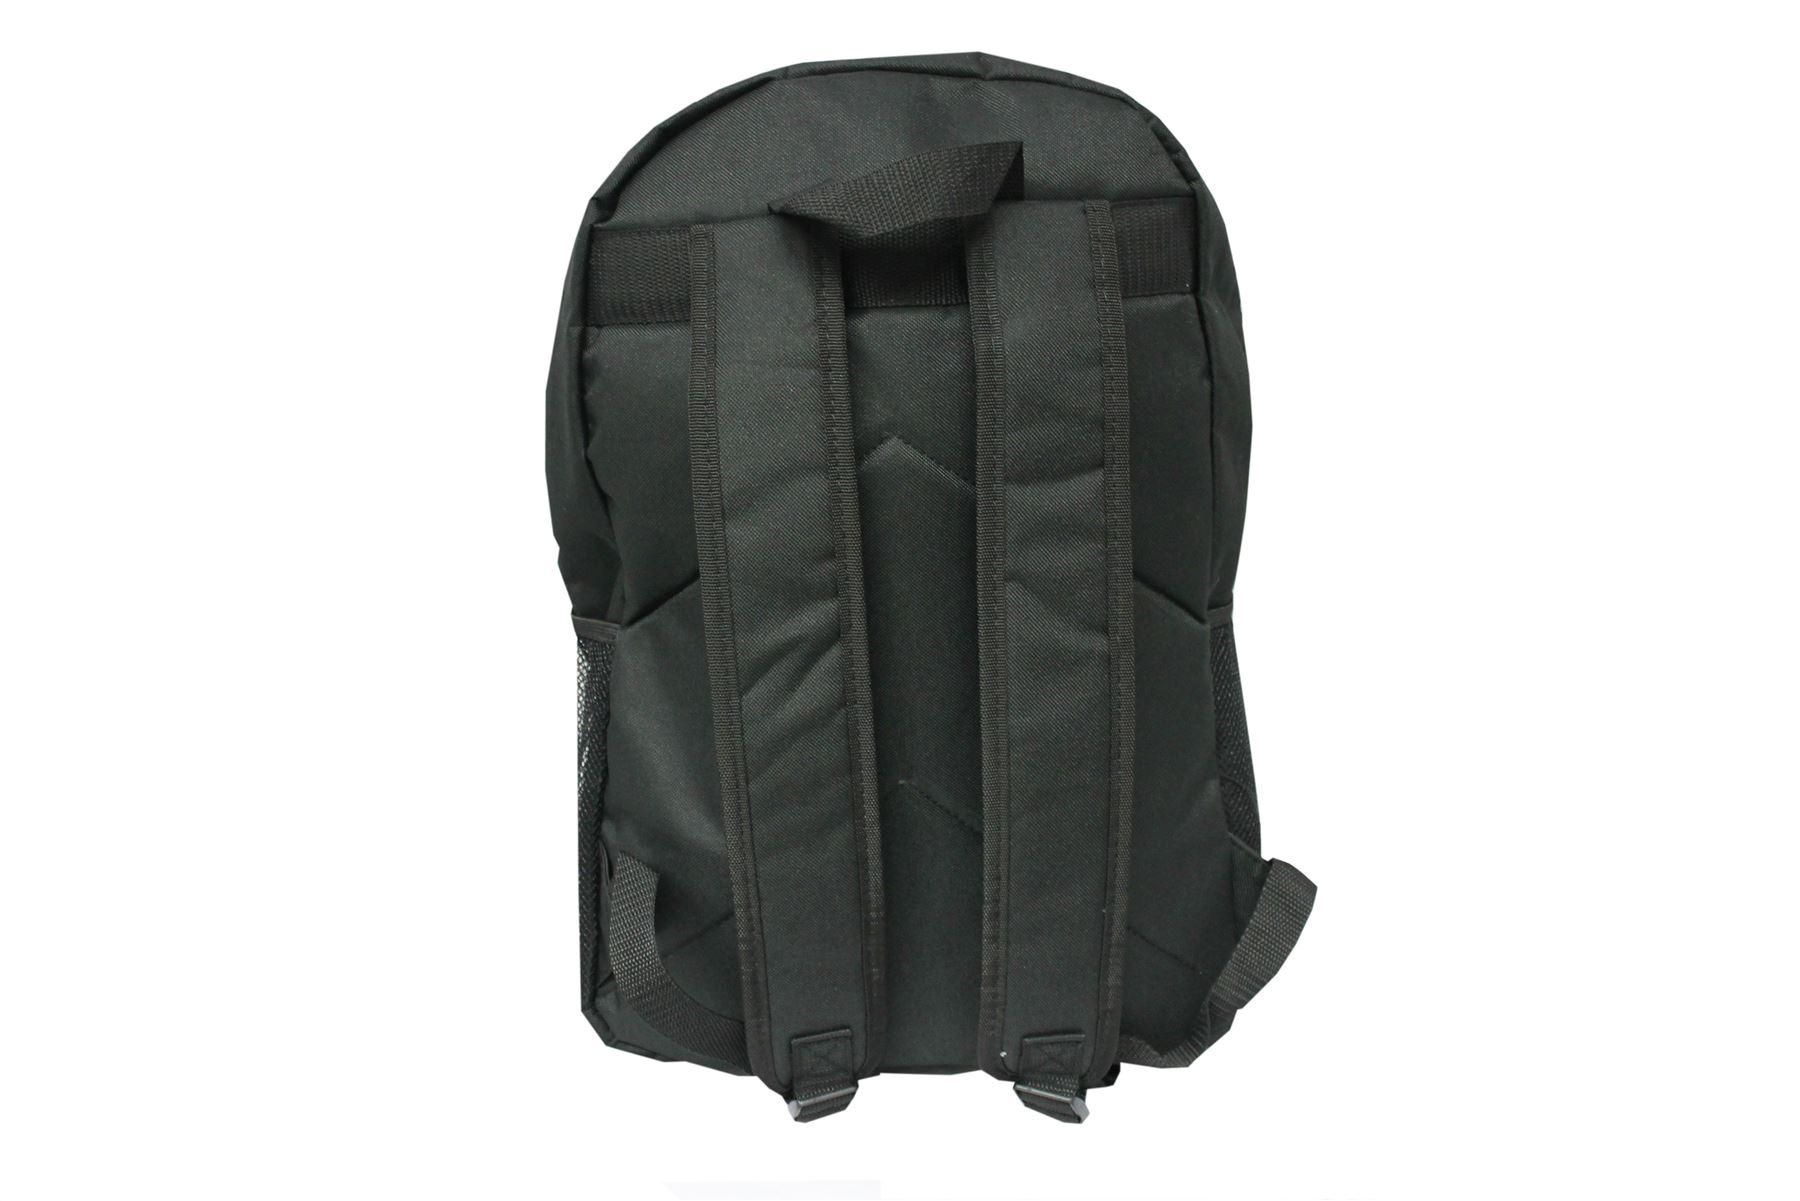 Backpacks & Bags Ragazzi Hi-tec Zaino Ht-1402